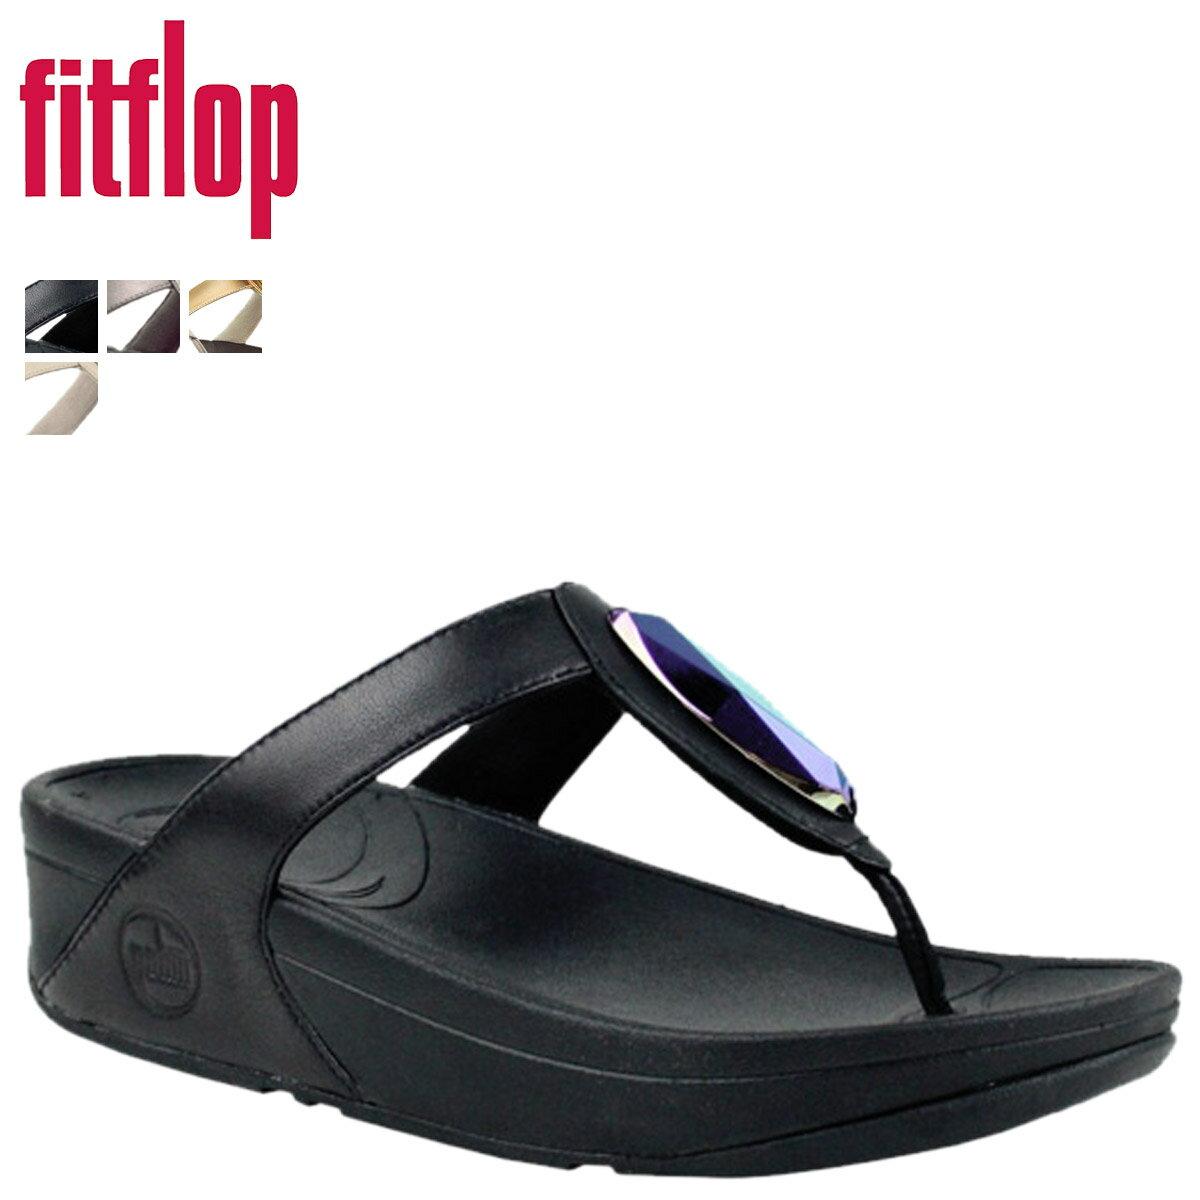 FitFlop フィットフロップ CHADA LEATHER チャダ サンダル 4カラー レザー SANDAL 364 レディース